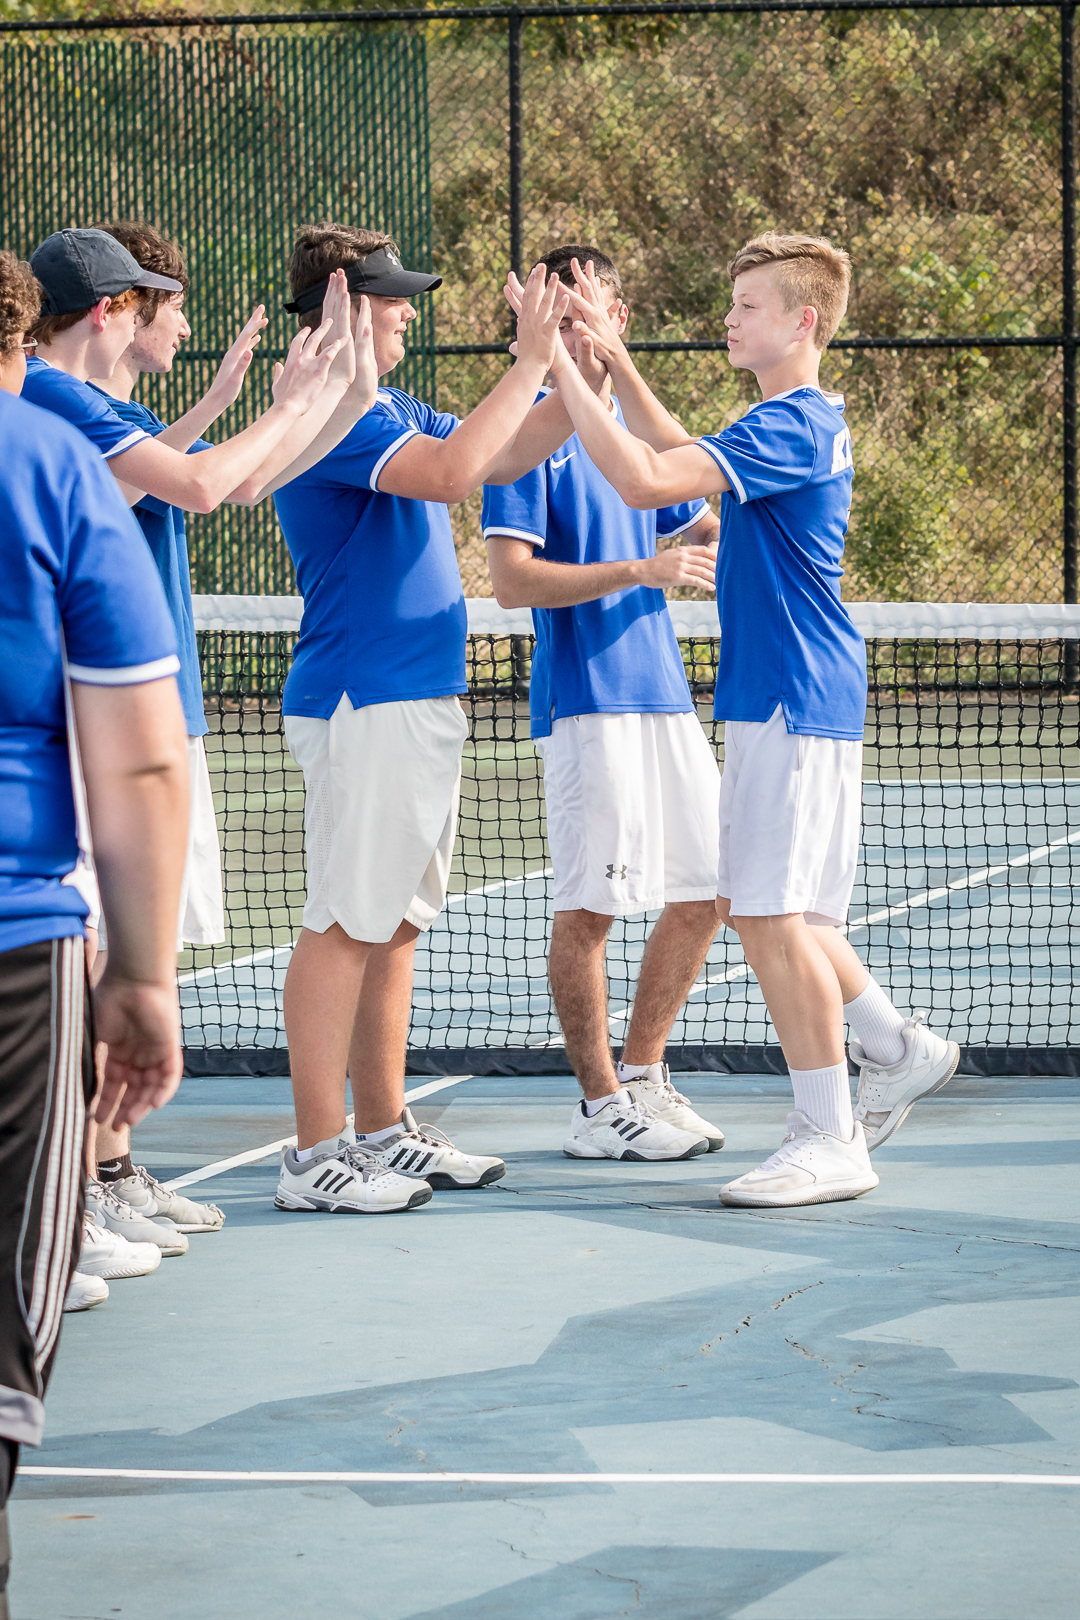 Marian-Boys-Tennis-1604.jpg